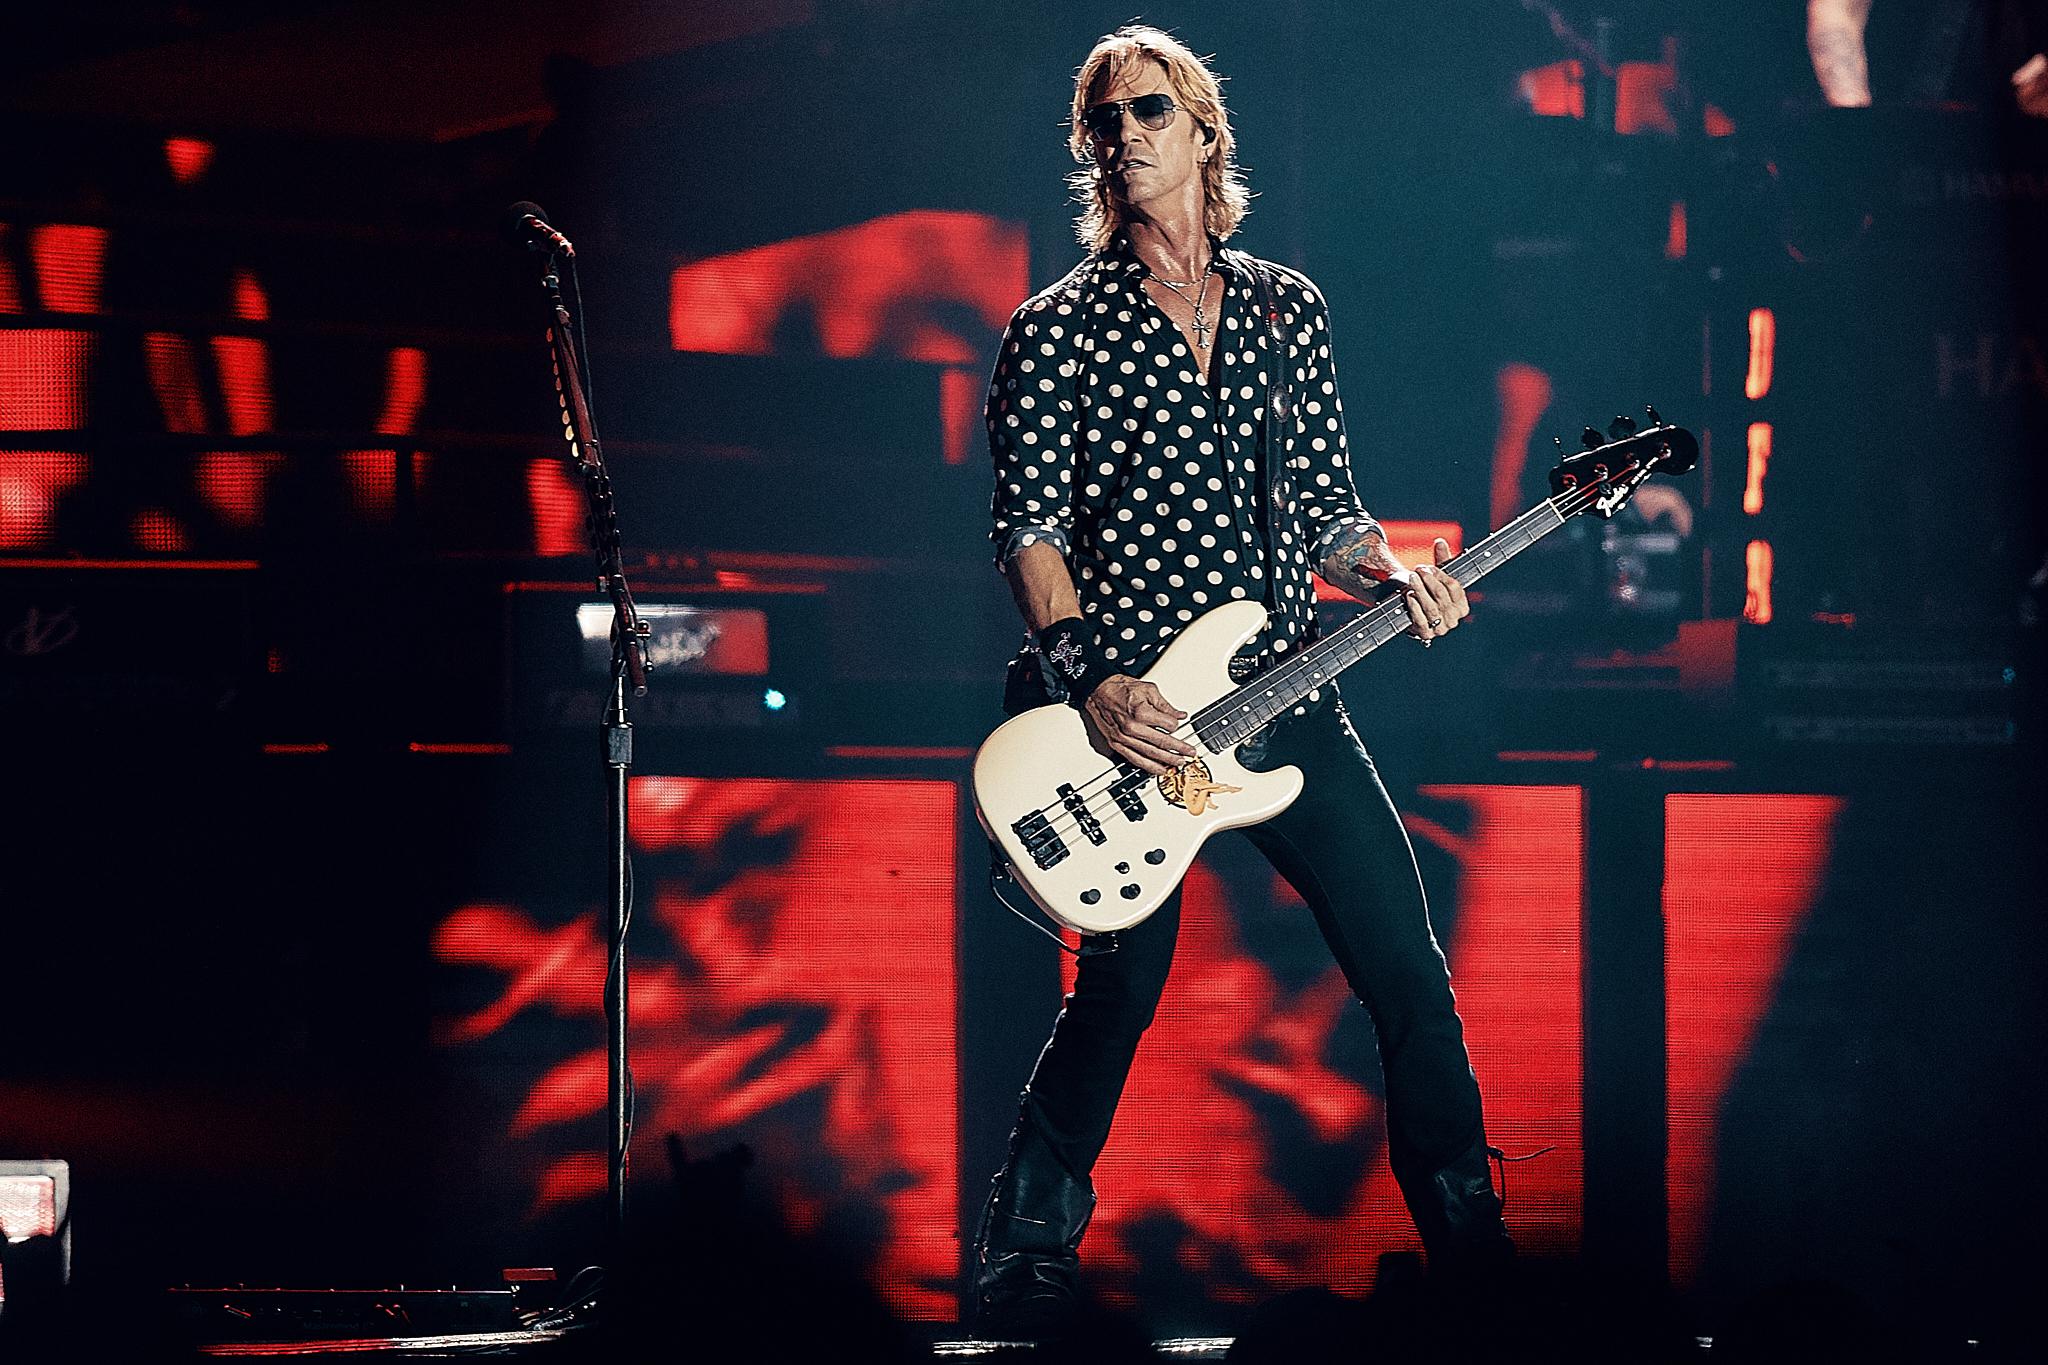 Guns_N_Roses_US_Bank_Stadium_Minneapolis_Minnesota_Photography_By_Joe_Lemke_031.JPG